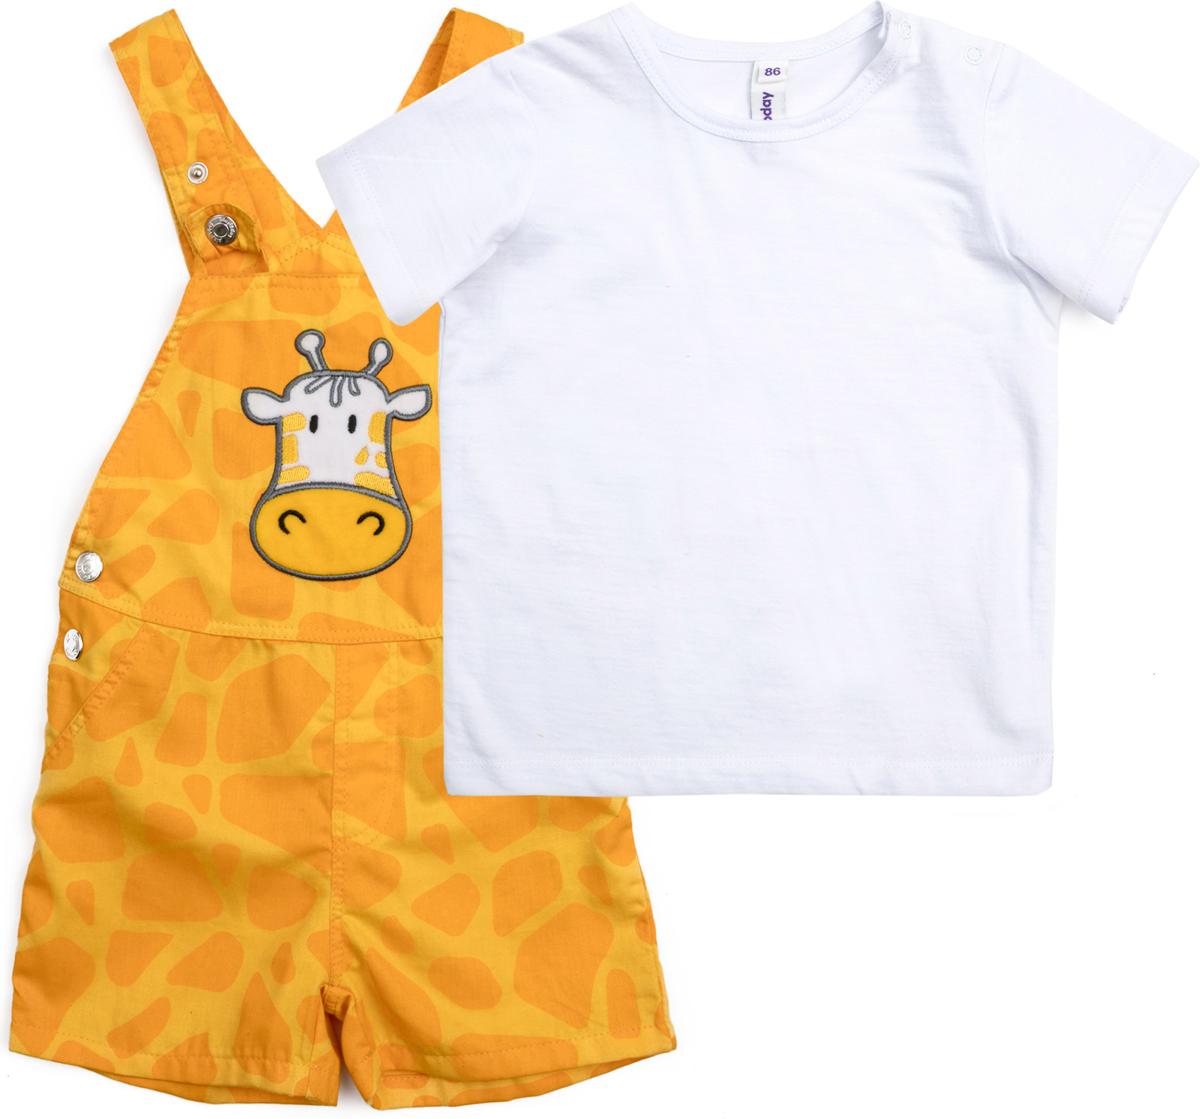 Комплект для мальчика PlayToday: футболка, полукомбинезон, цвет: белый, желтый. 187055. Размер 86